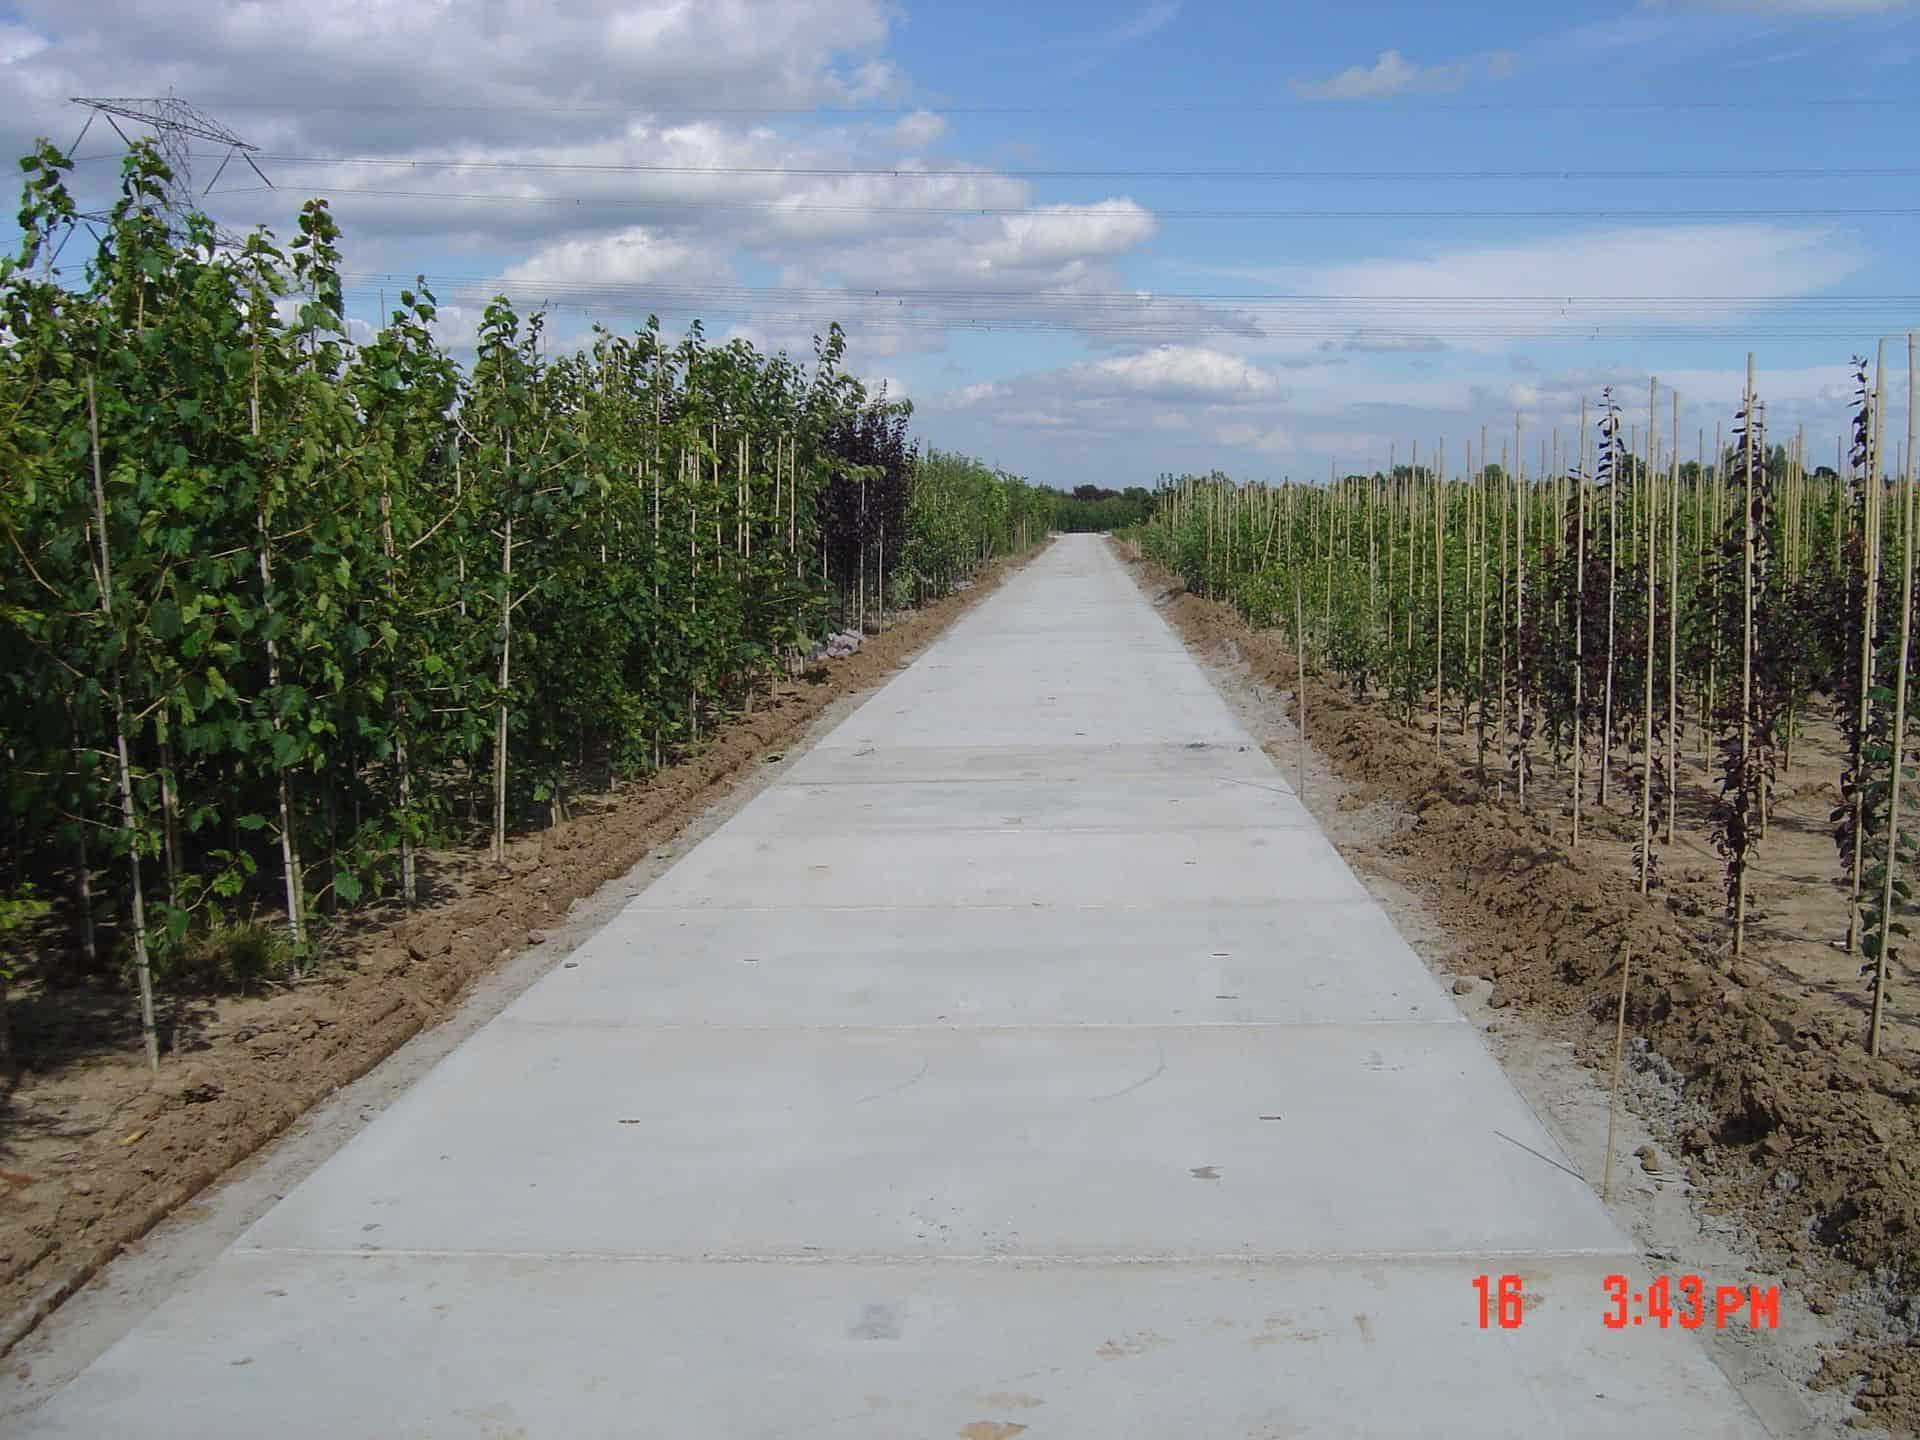 Project diverse kwekerijen | Kavelpaden | De Keij